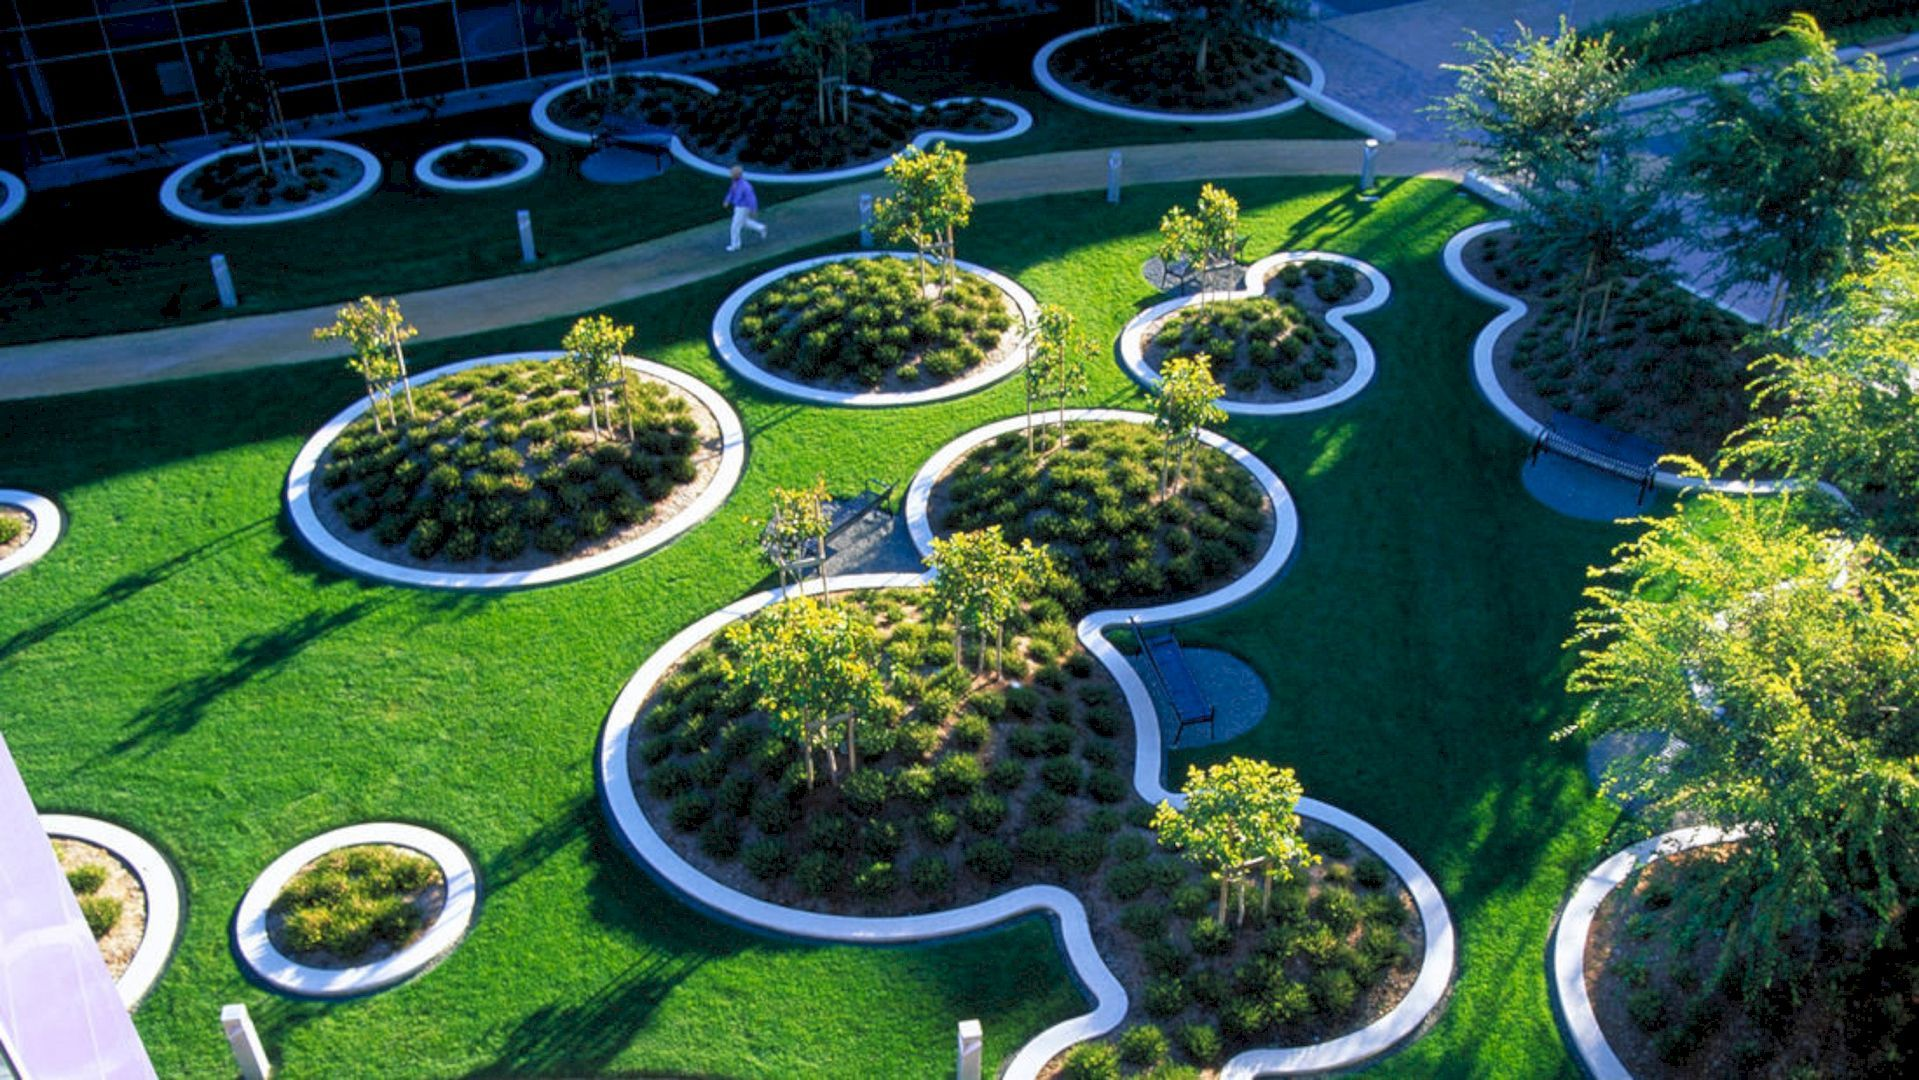 Google Headquarters The Most Significant Modern Landscapes In The Last Century Garden Landscape Design Public Garden Campus Landscape